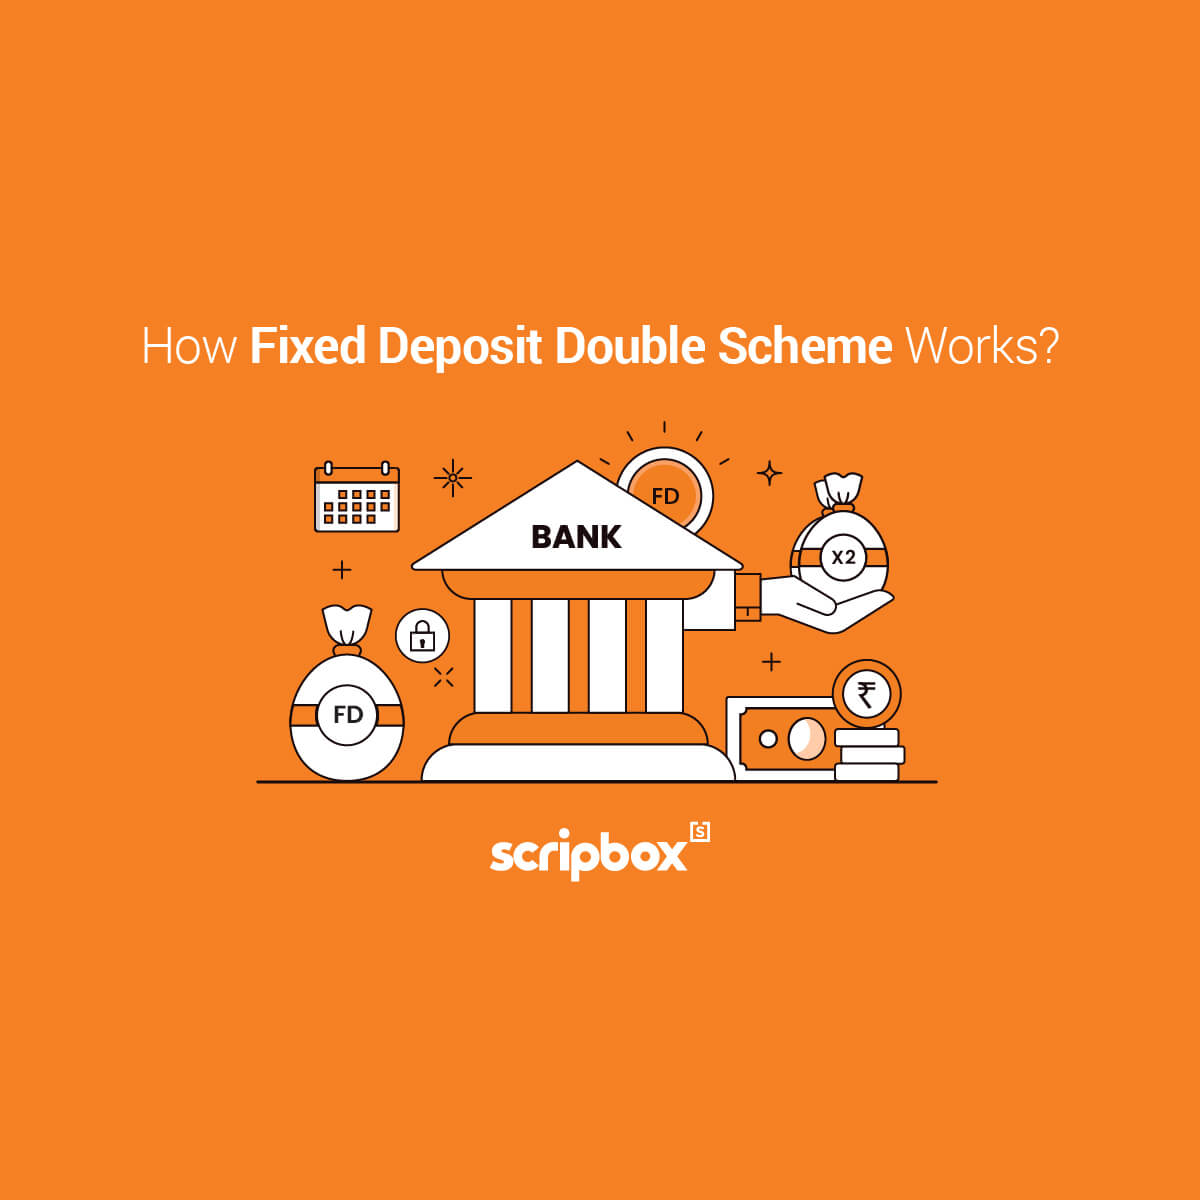 fixed deposit double scheme